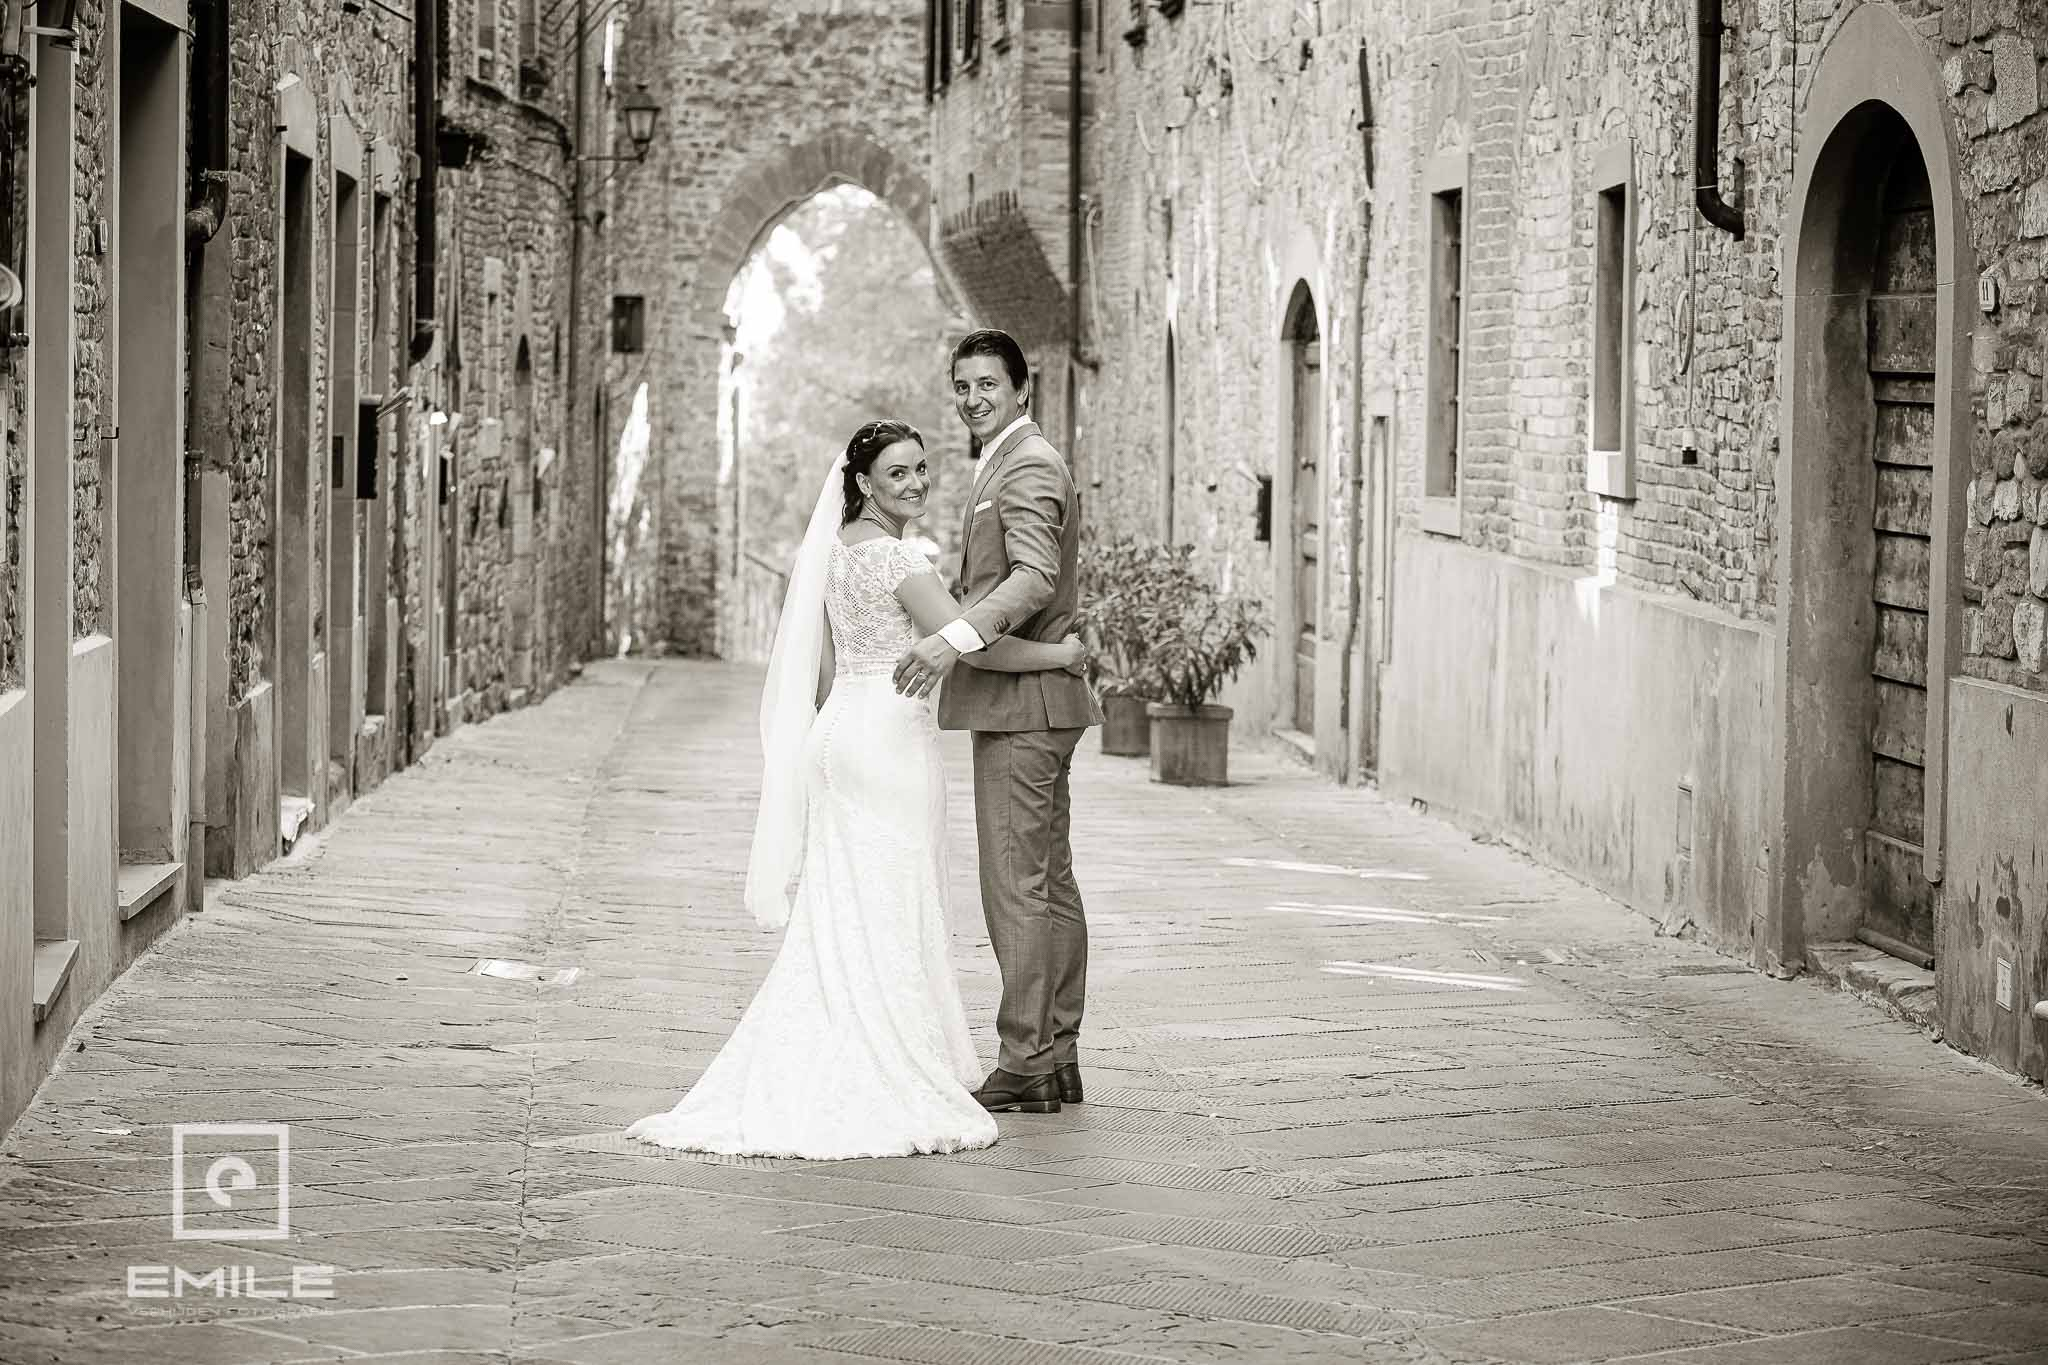 Samen in een steegje - Destination wedding San Gimignano - Toscane Italie - Iris en Job